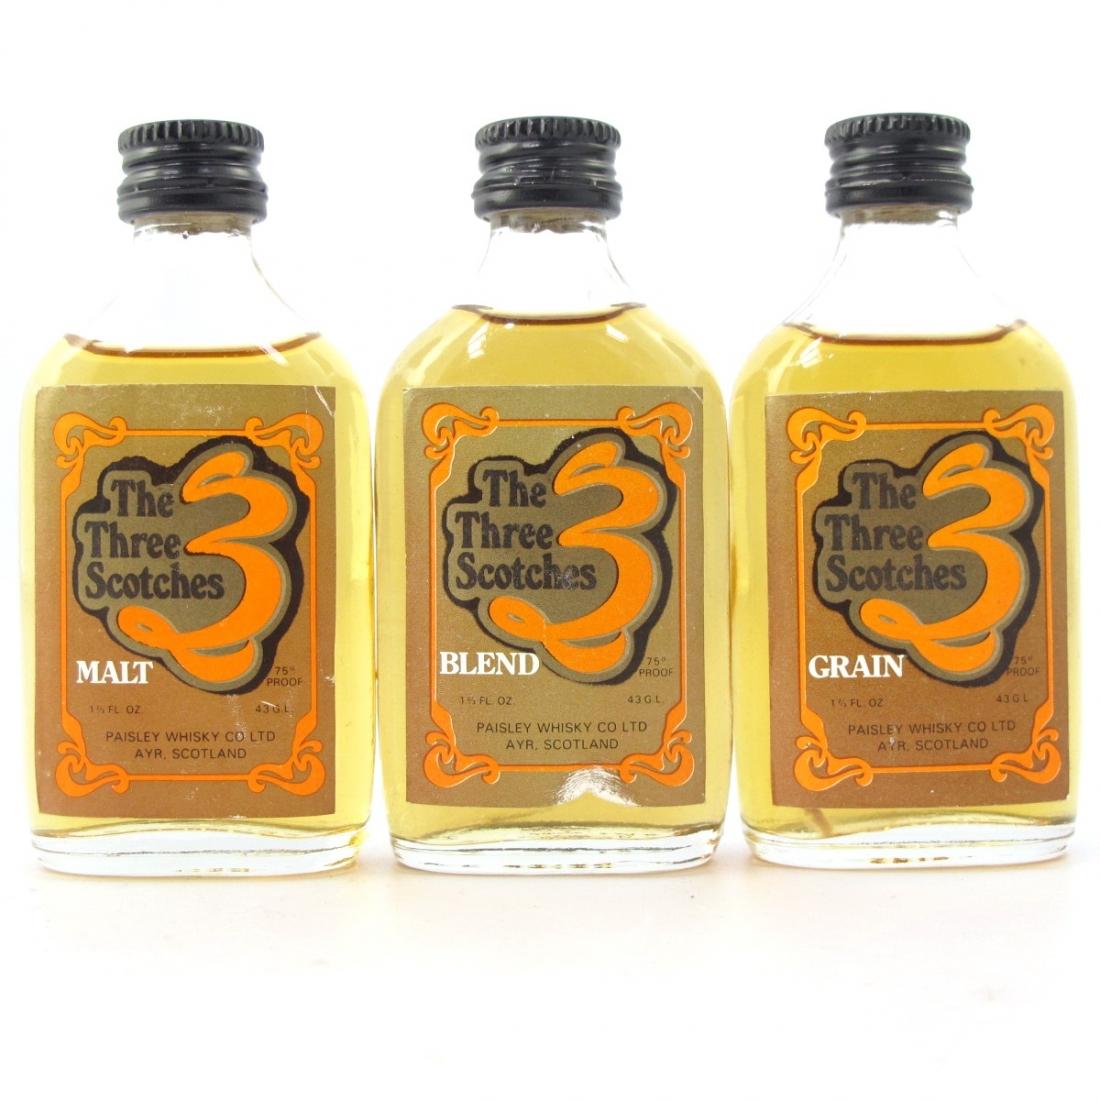 The Three Scotches Selection x 3 / Blend / Grain / Malt